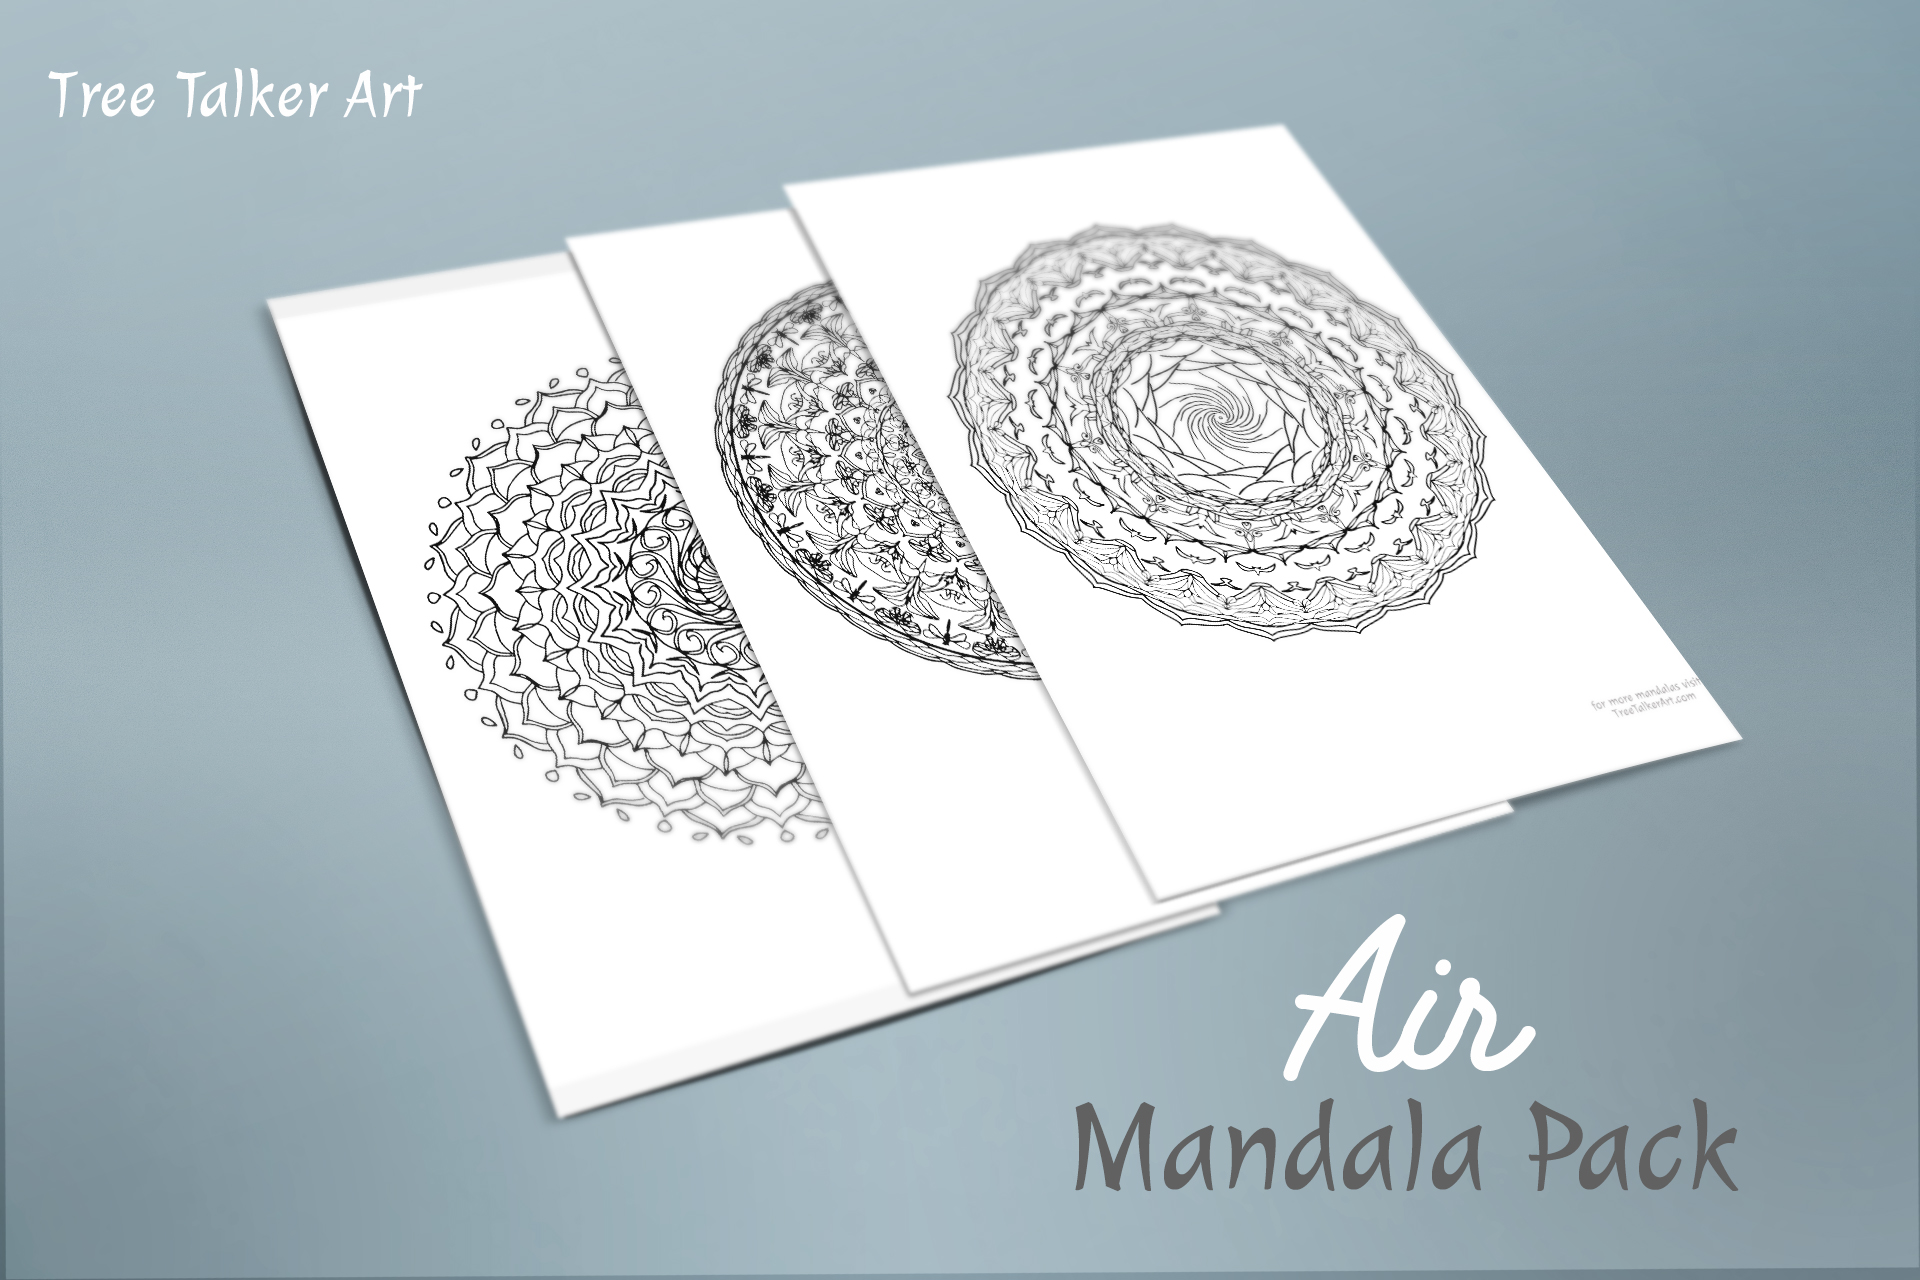 Air Downloadable Mandala Meditation Pack | Tree Talker Art